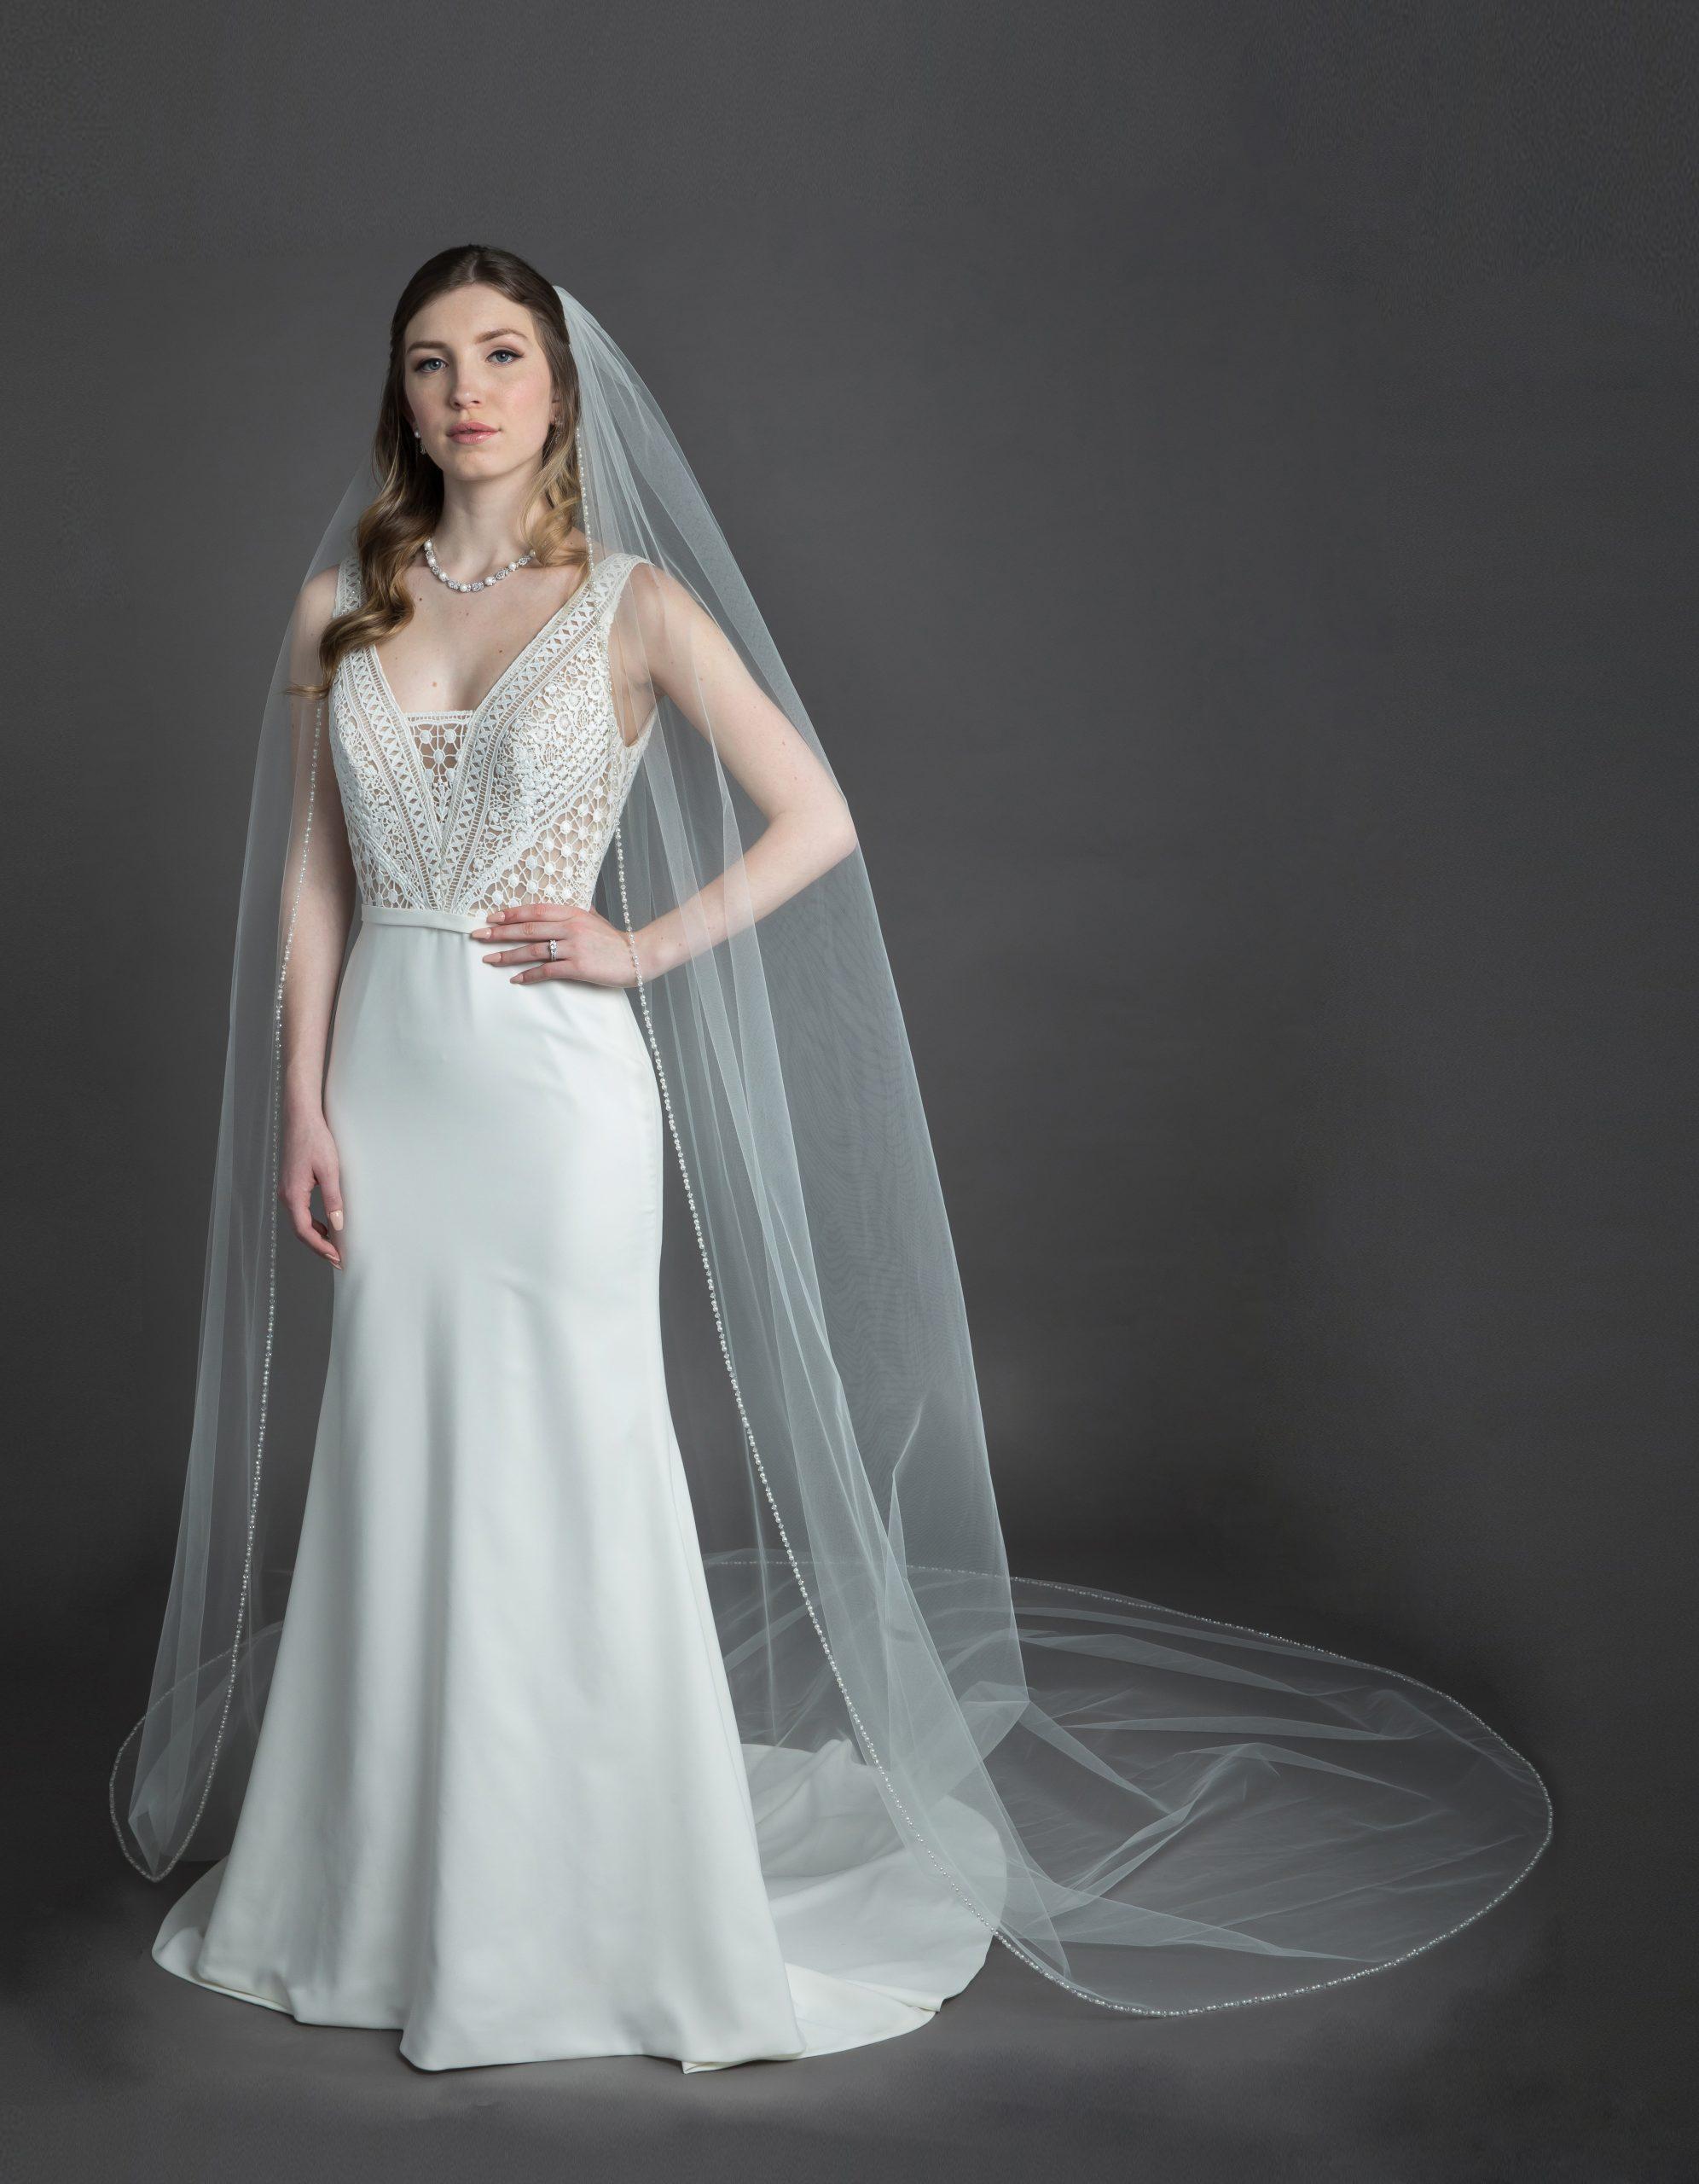 Bridal Classics Marquise Veils MV-2470